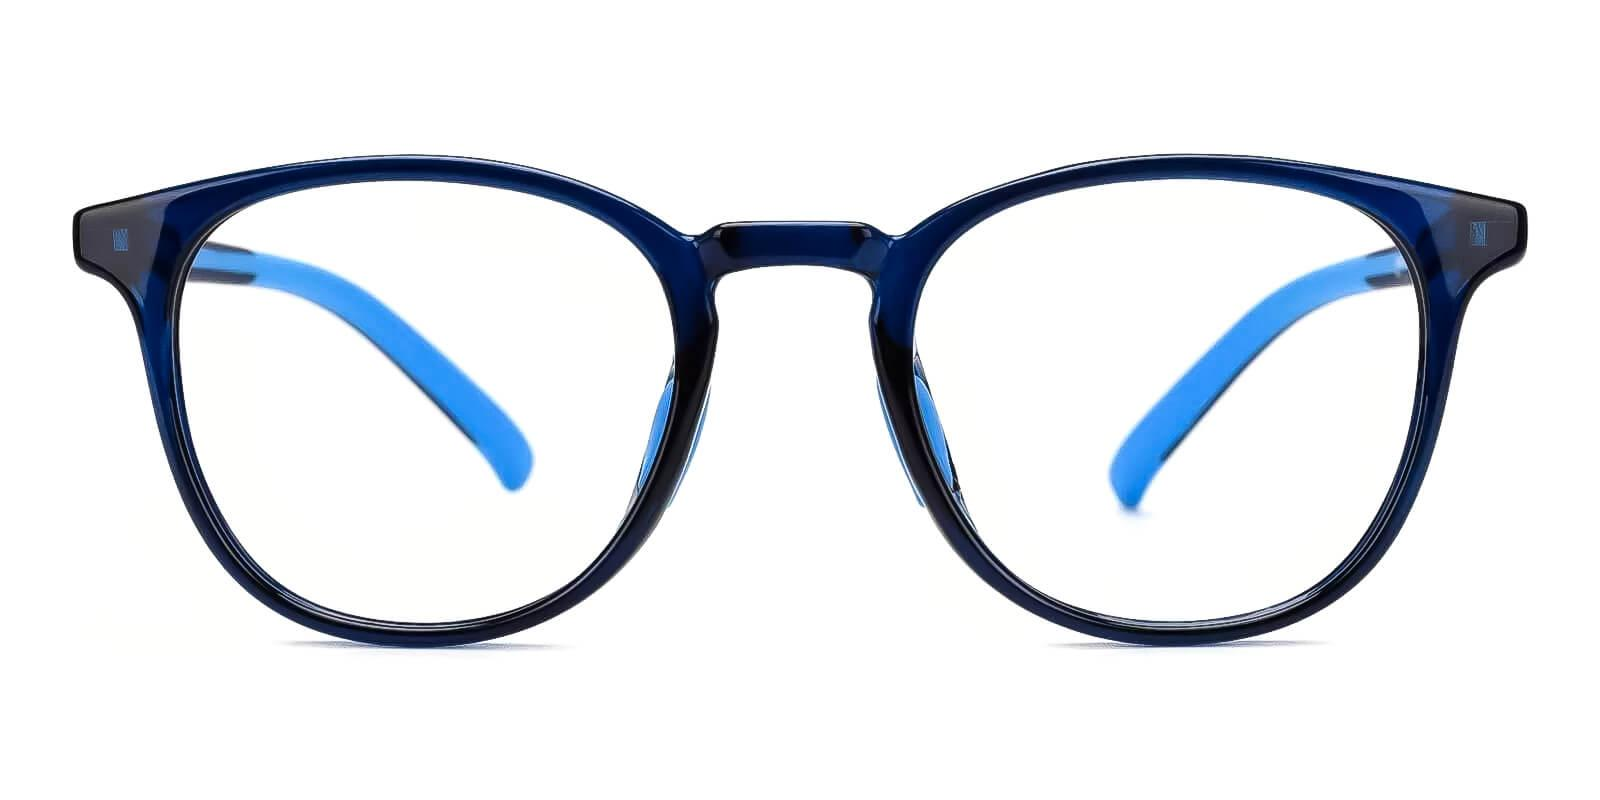 Kids-Experience Blue Plastic Eyeglasses , Fashion , UniversalBridgeFit Frames from ABBE Glasses